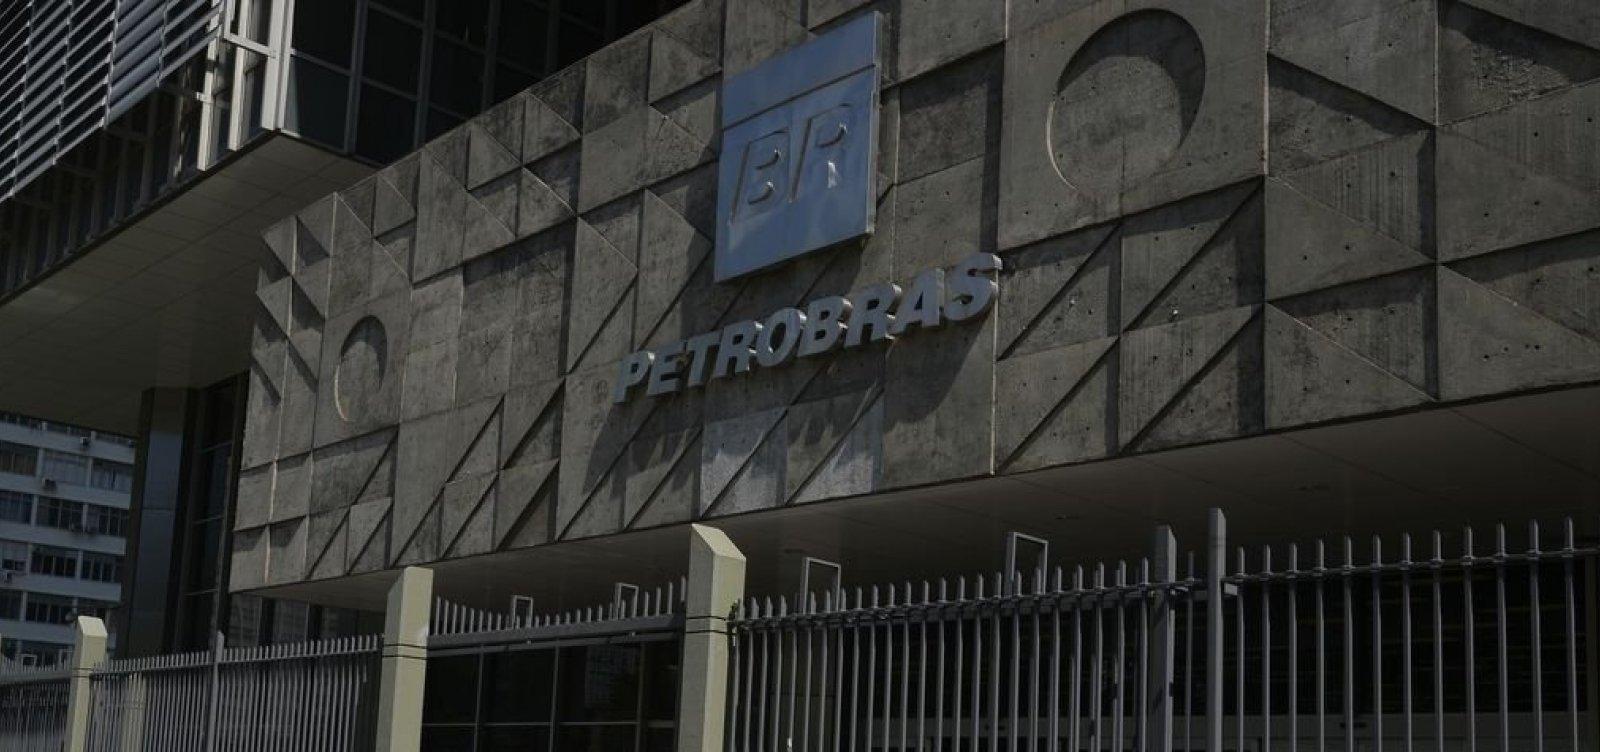 Petrobras lidera ranking de derramamento de óleo desde 2012